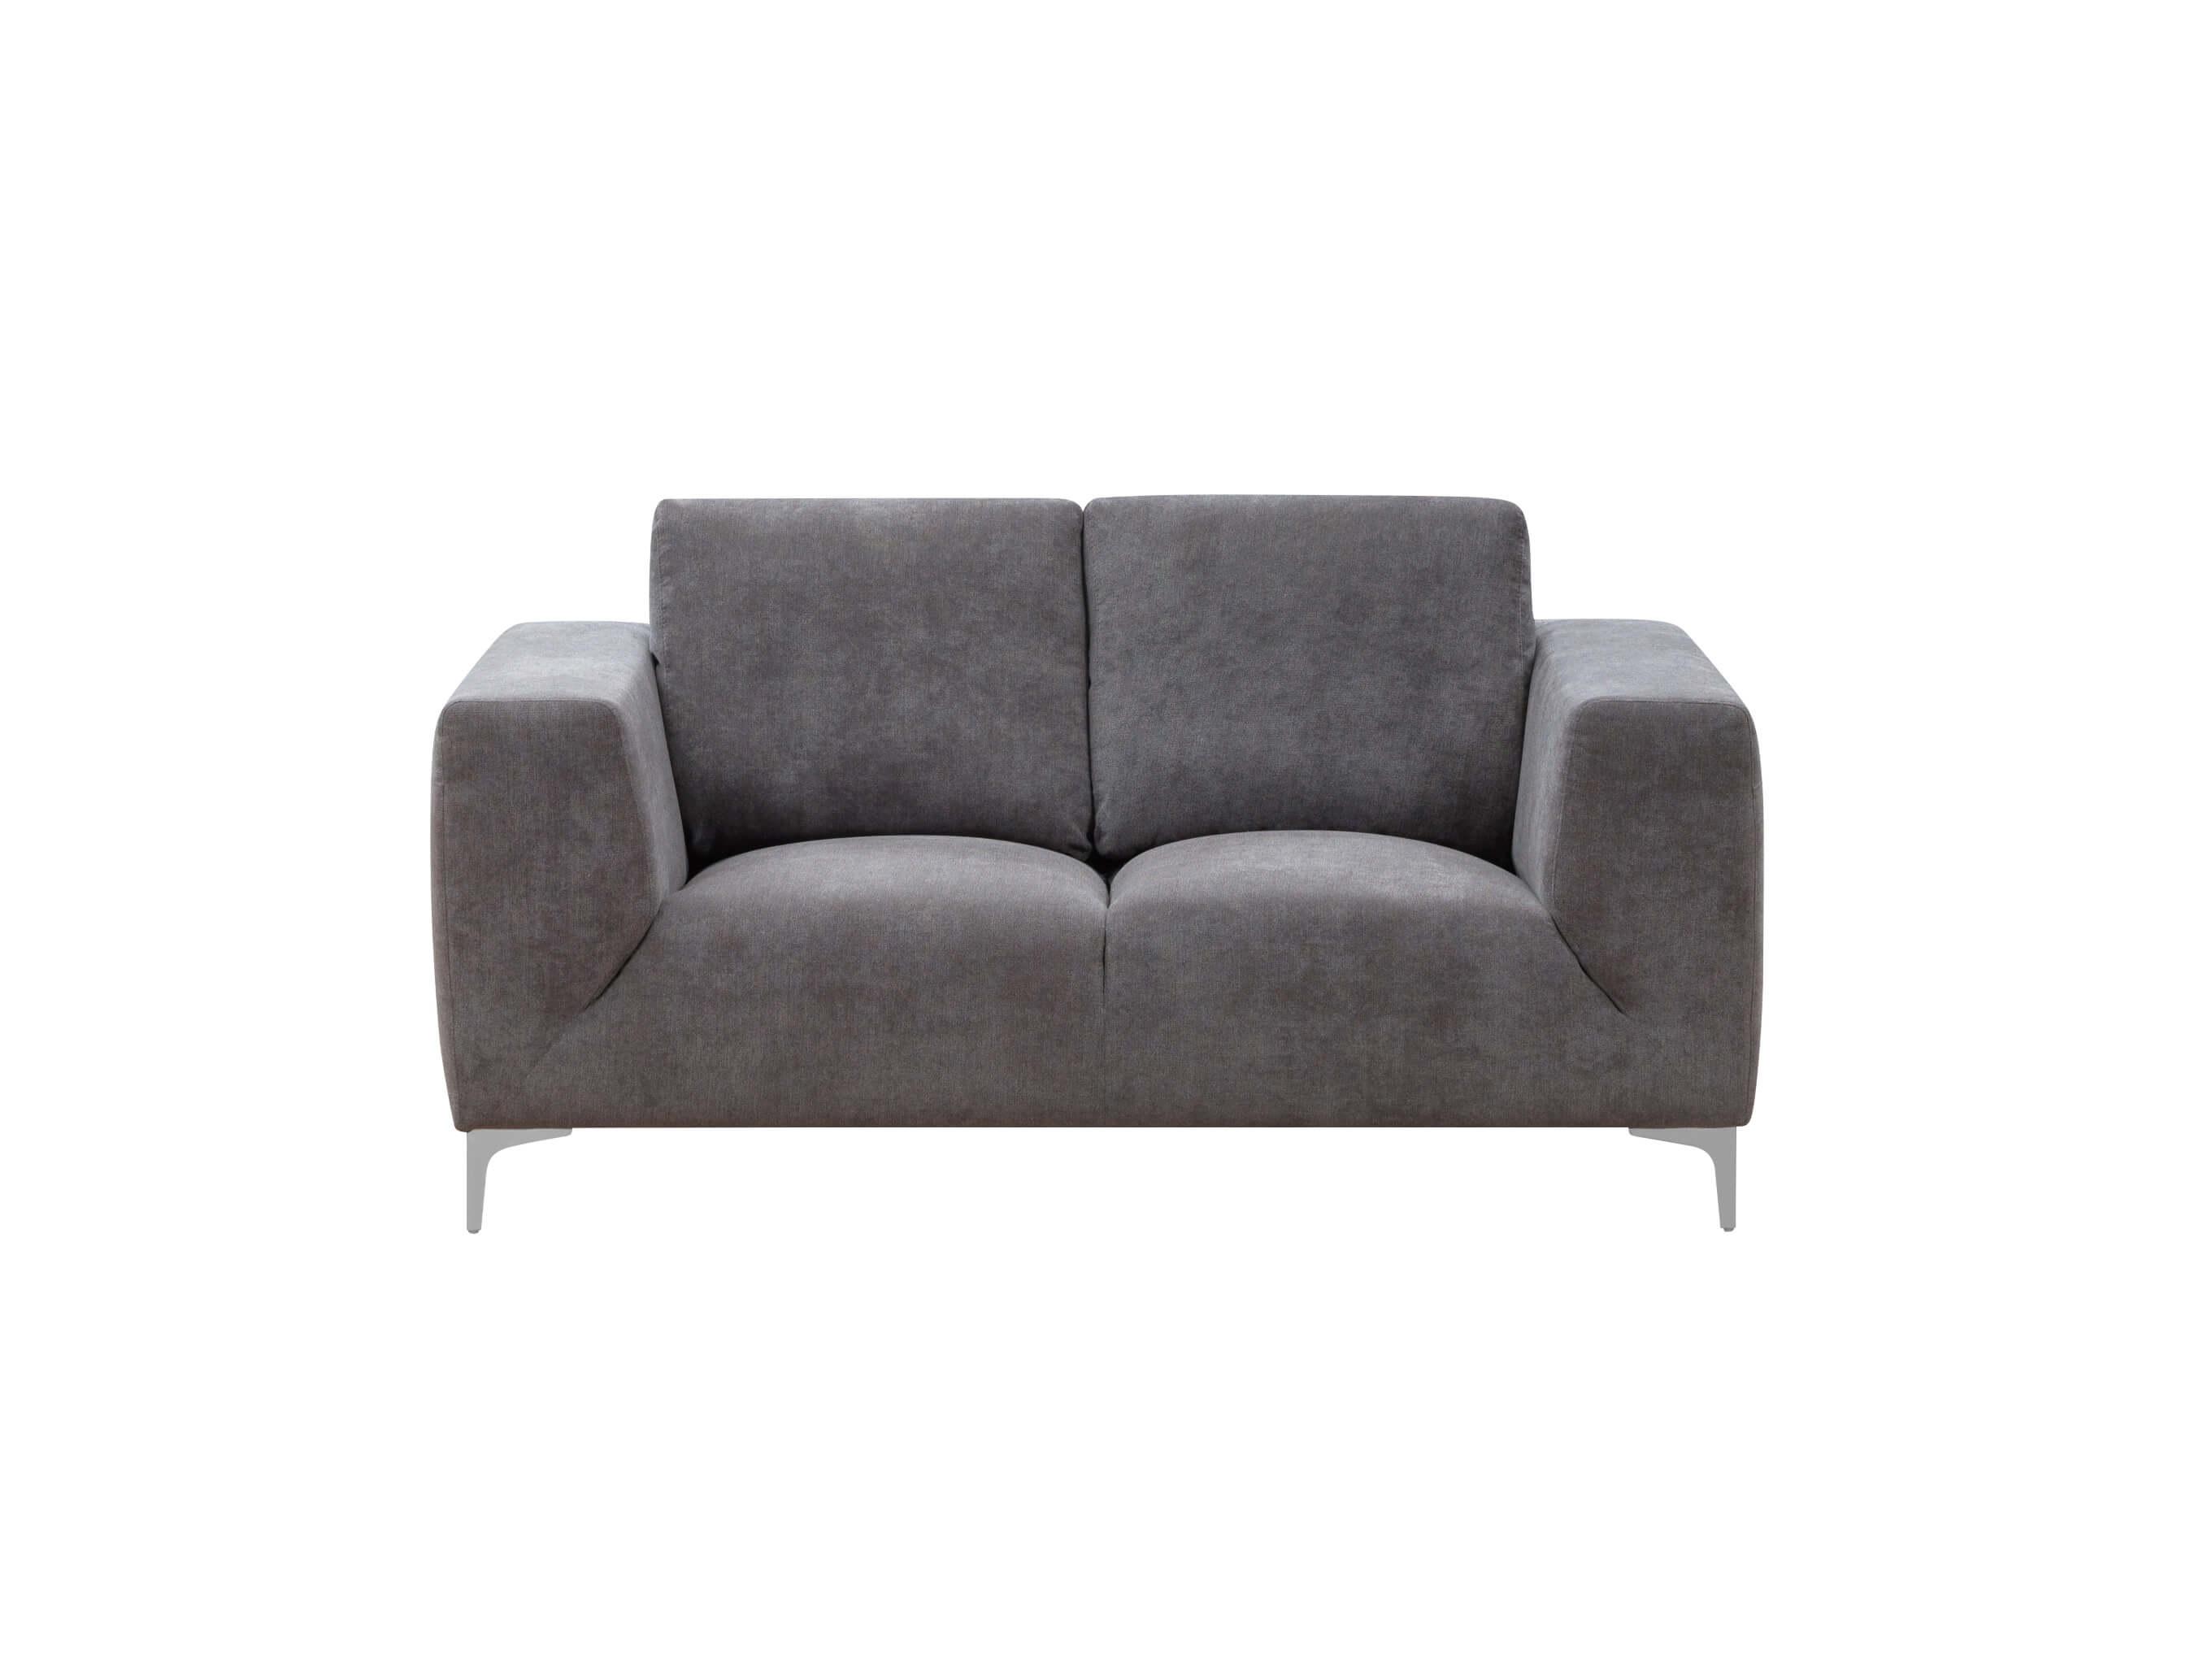 Grey Contemporary Sofa and Loveseat